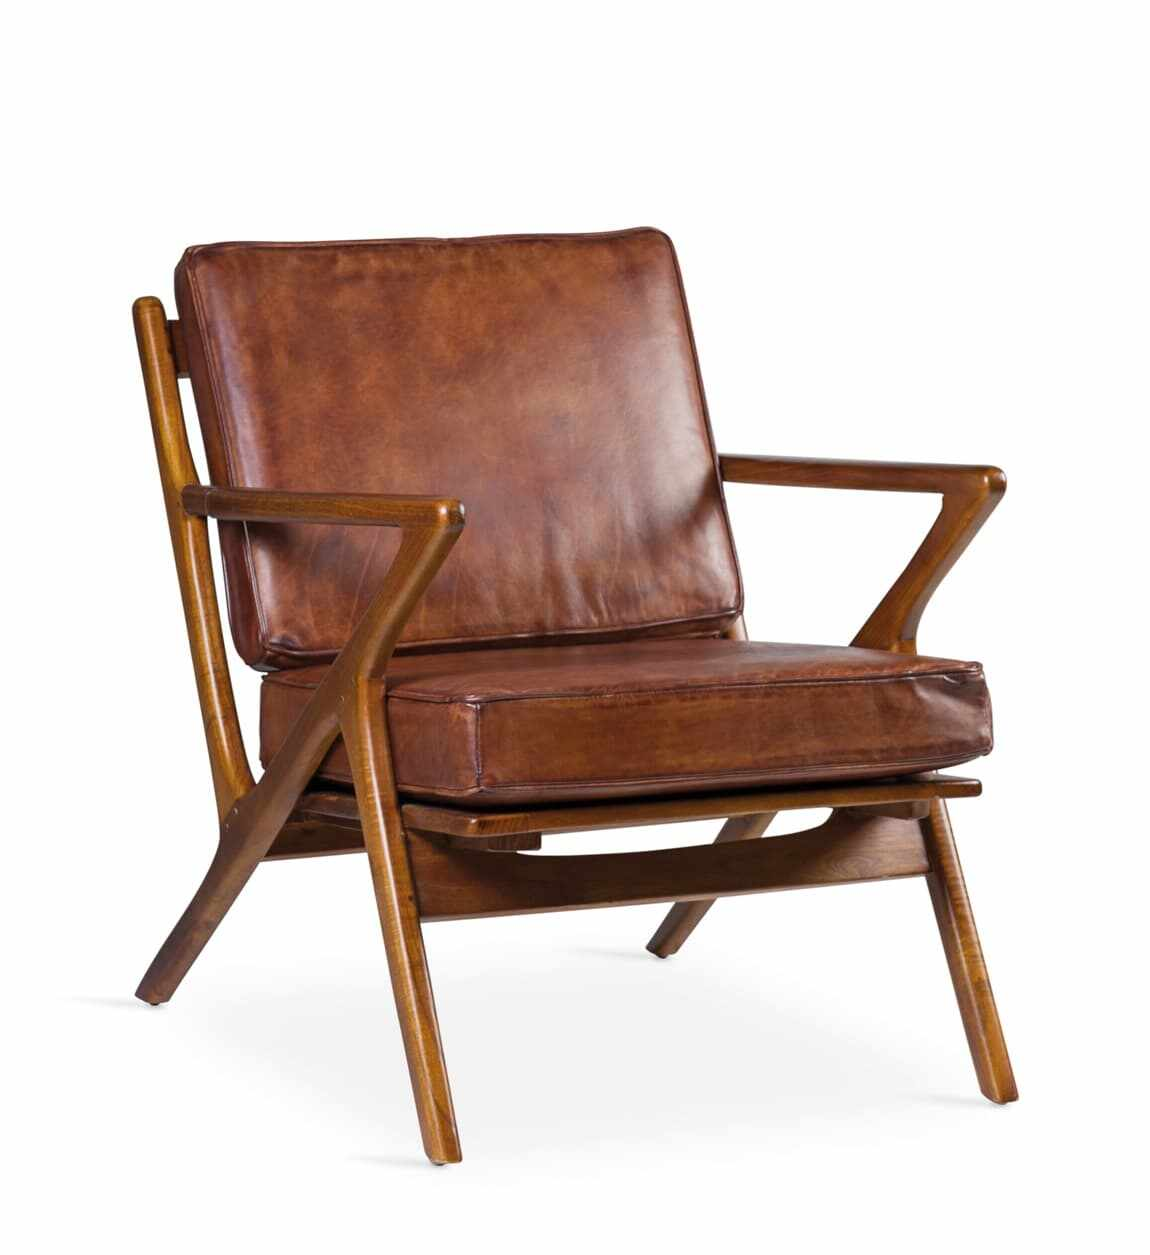 Fotoliu fix din lemn si perne detasabile tapitate cu piele, Cushion Maro, l65xA70xH75 cm la pret 1480 lei